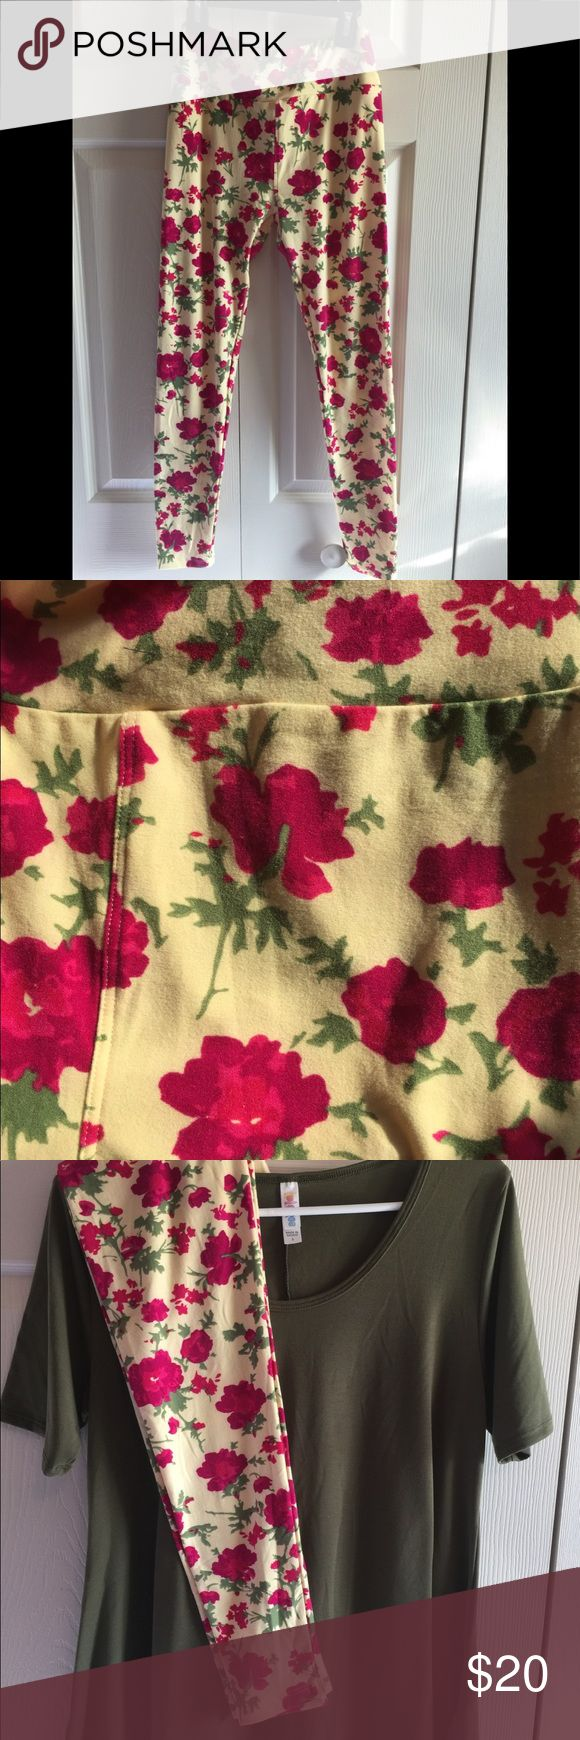 LuLaRoe leggings floral size OS LuLaRoe leggings. Size OS. Excellent used Condition. Yellow floral design. LuLaRoe Pants Leggings